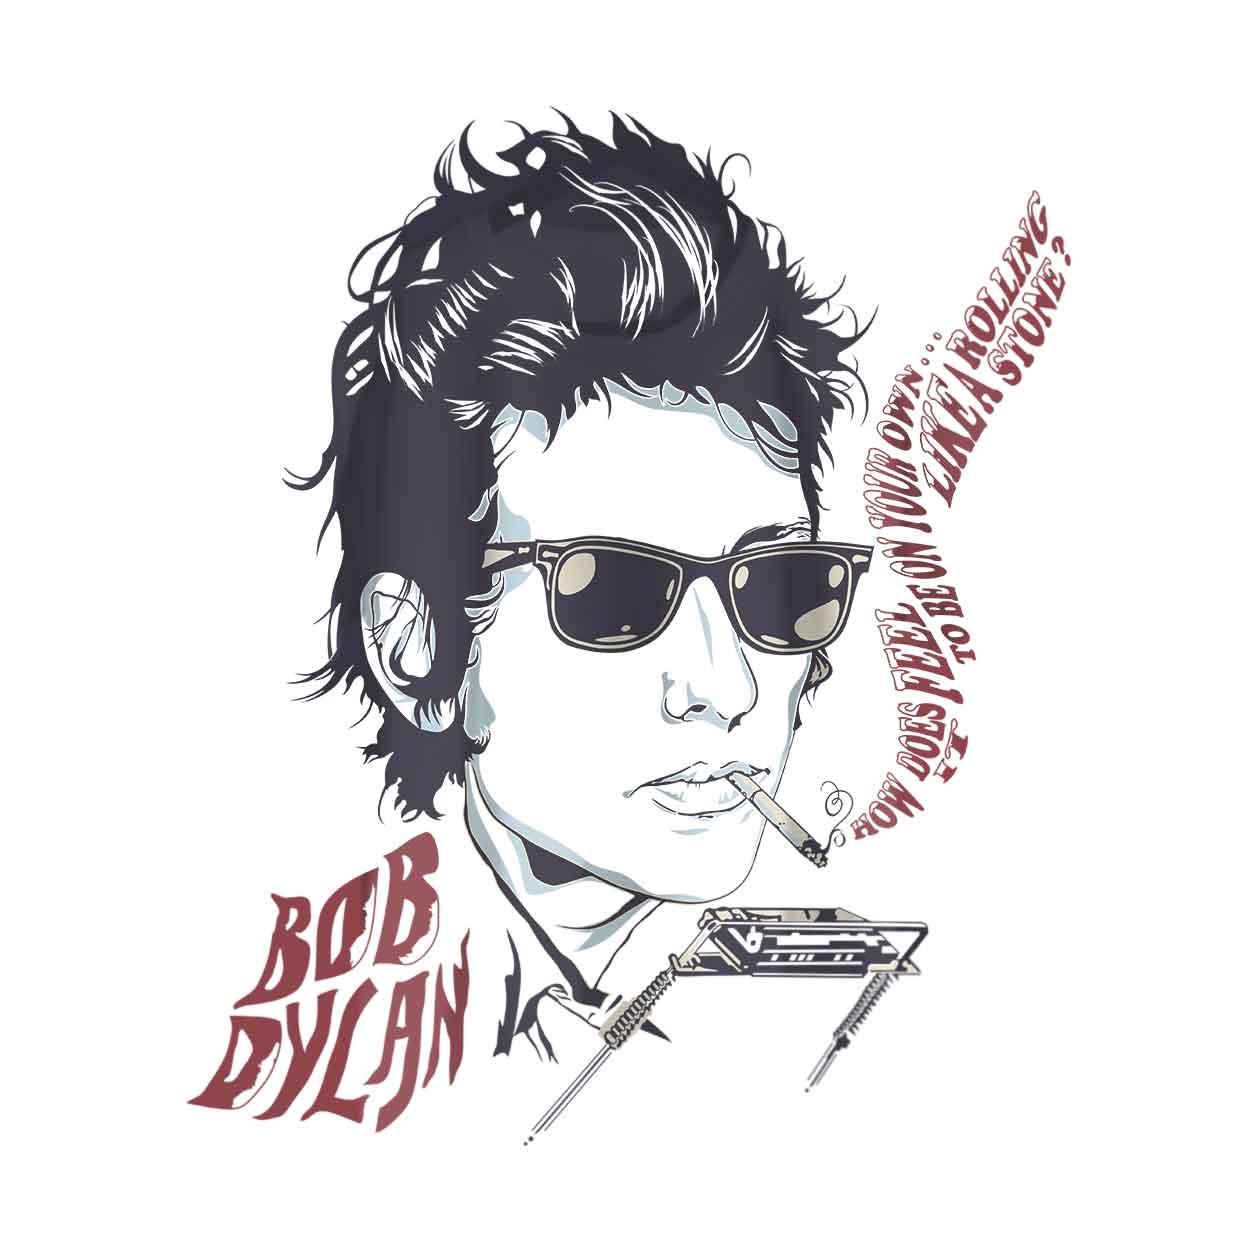 Camiseta - Like a Rolling Stones, gaita - Bob Dylan - Masculino